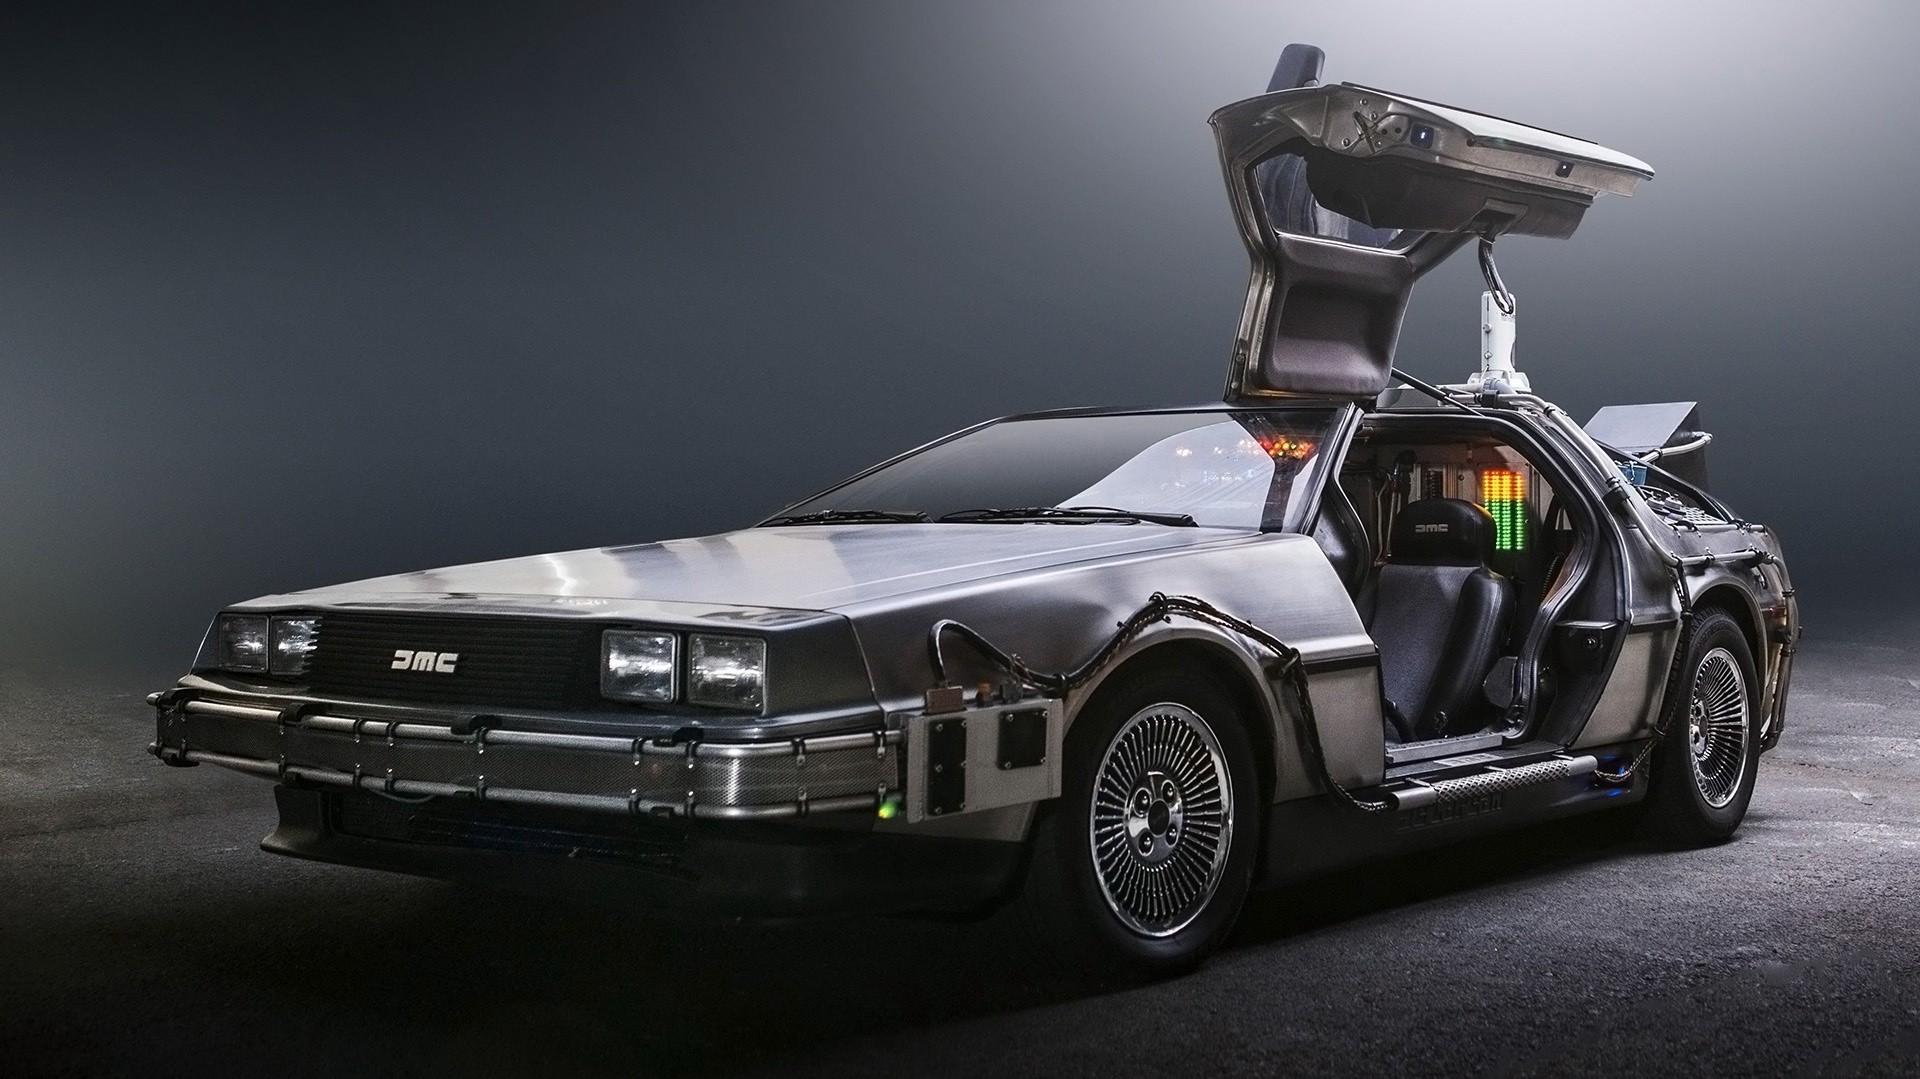 supercars time travel back to the future delorean